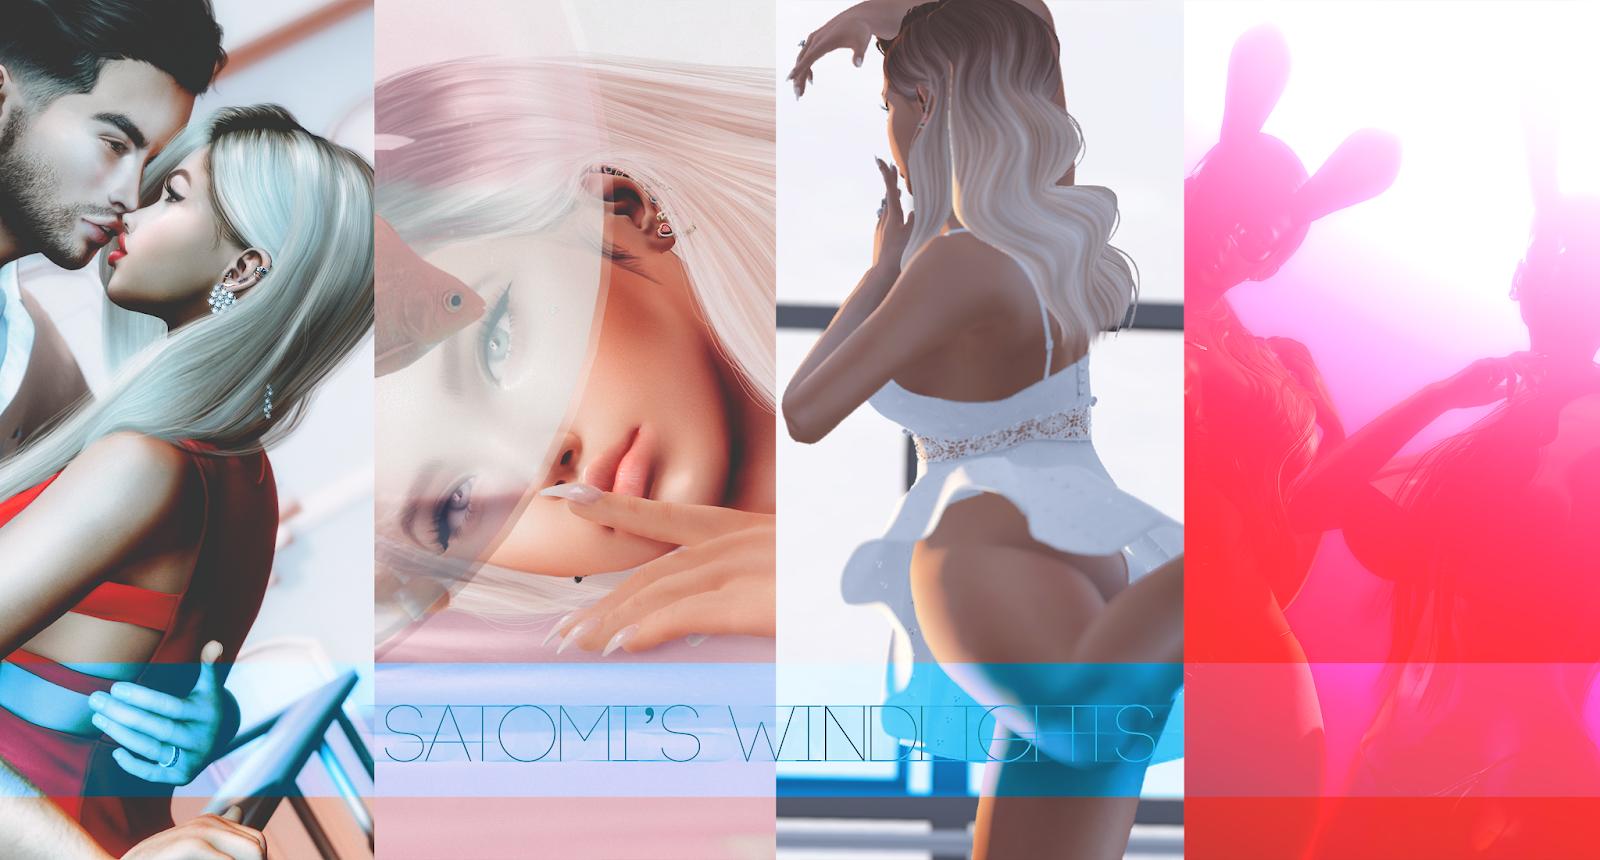 FOXCITY: Satomi's Windlights